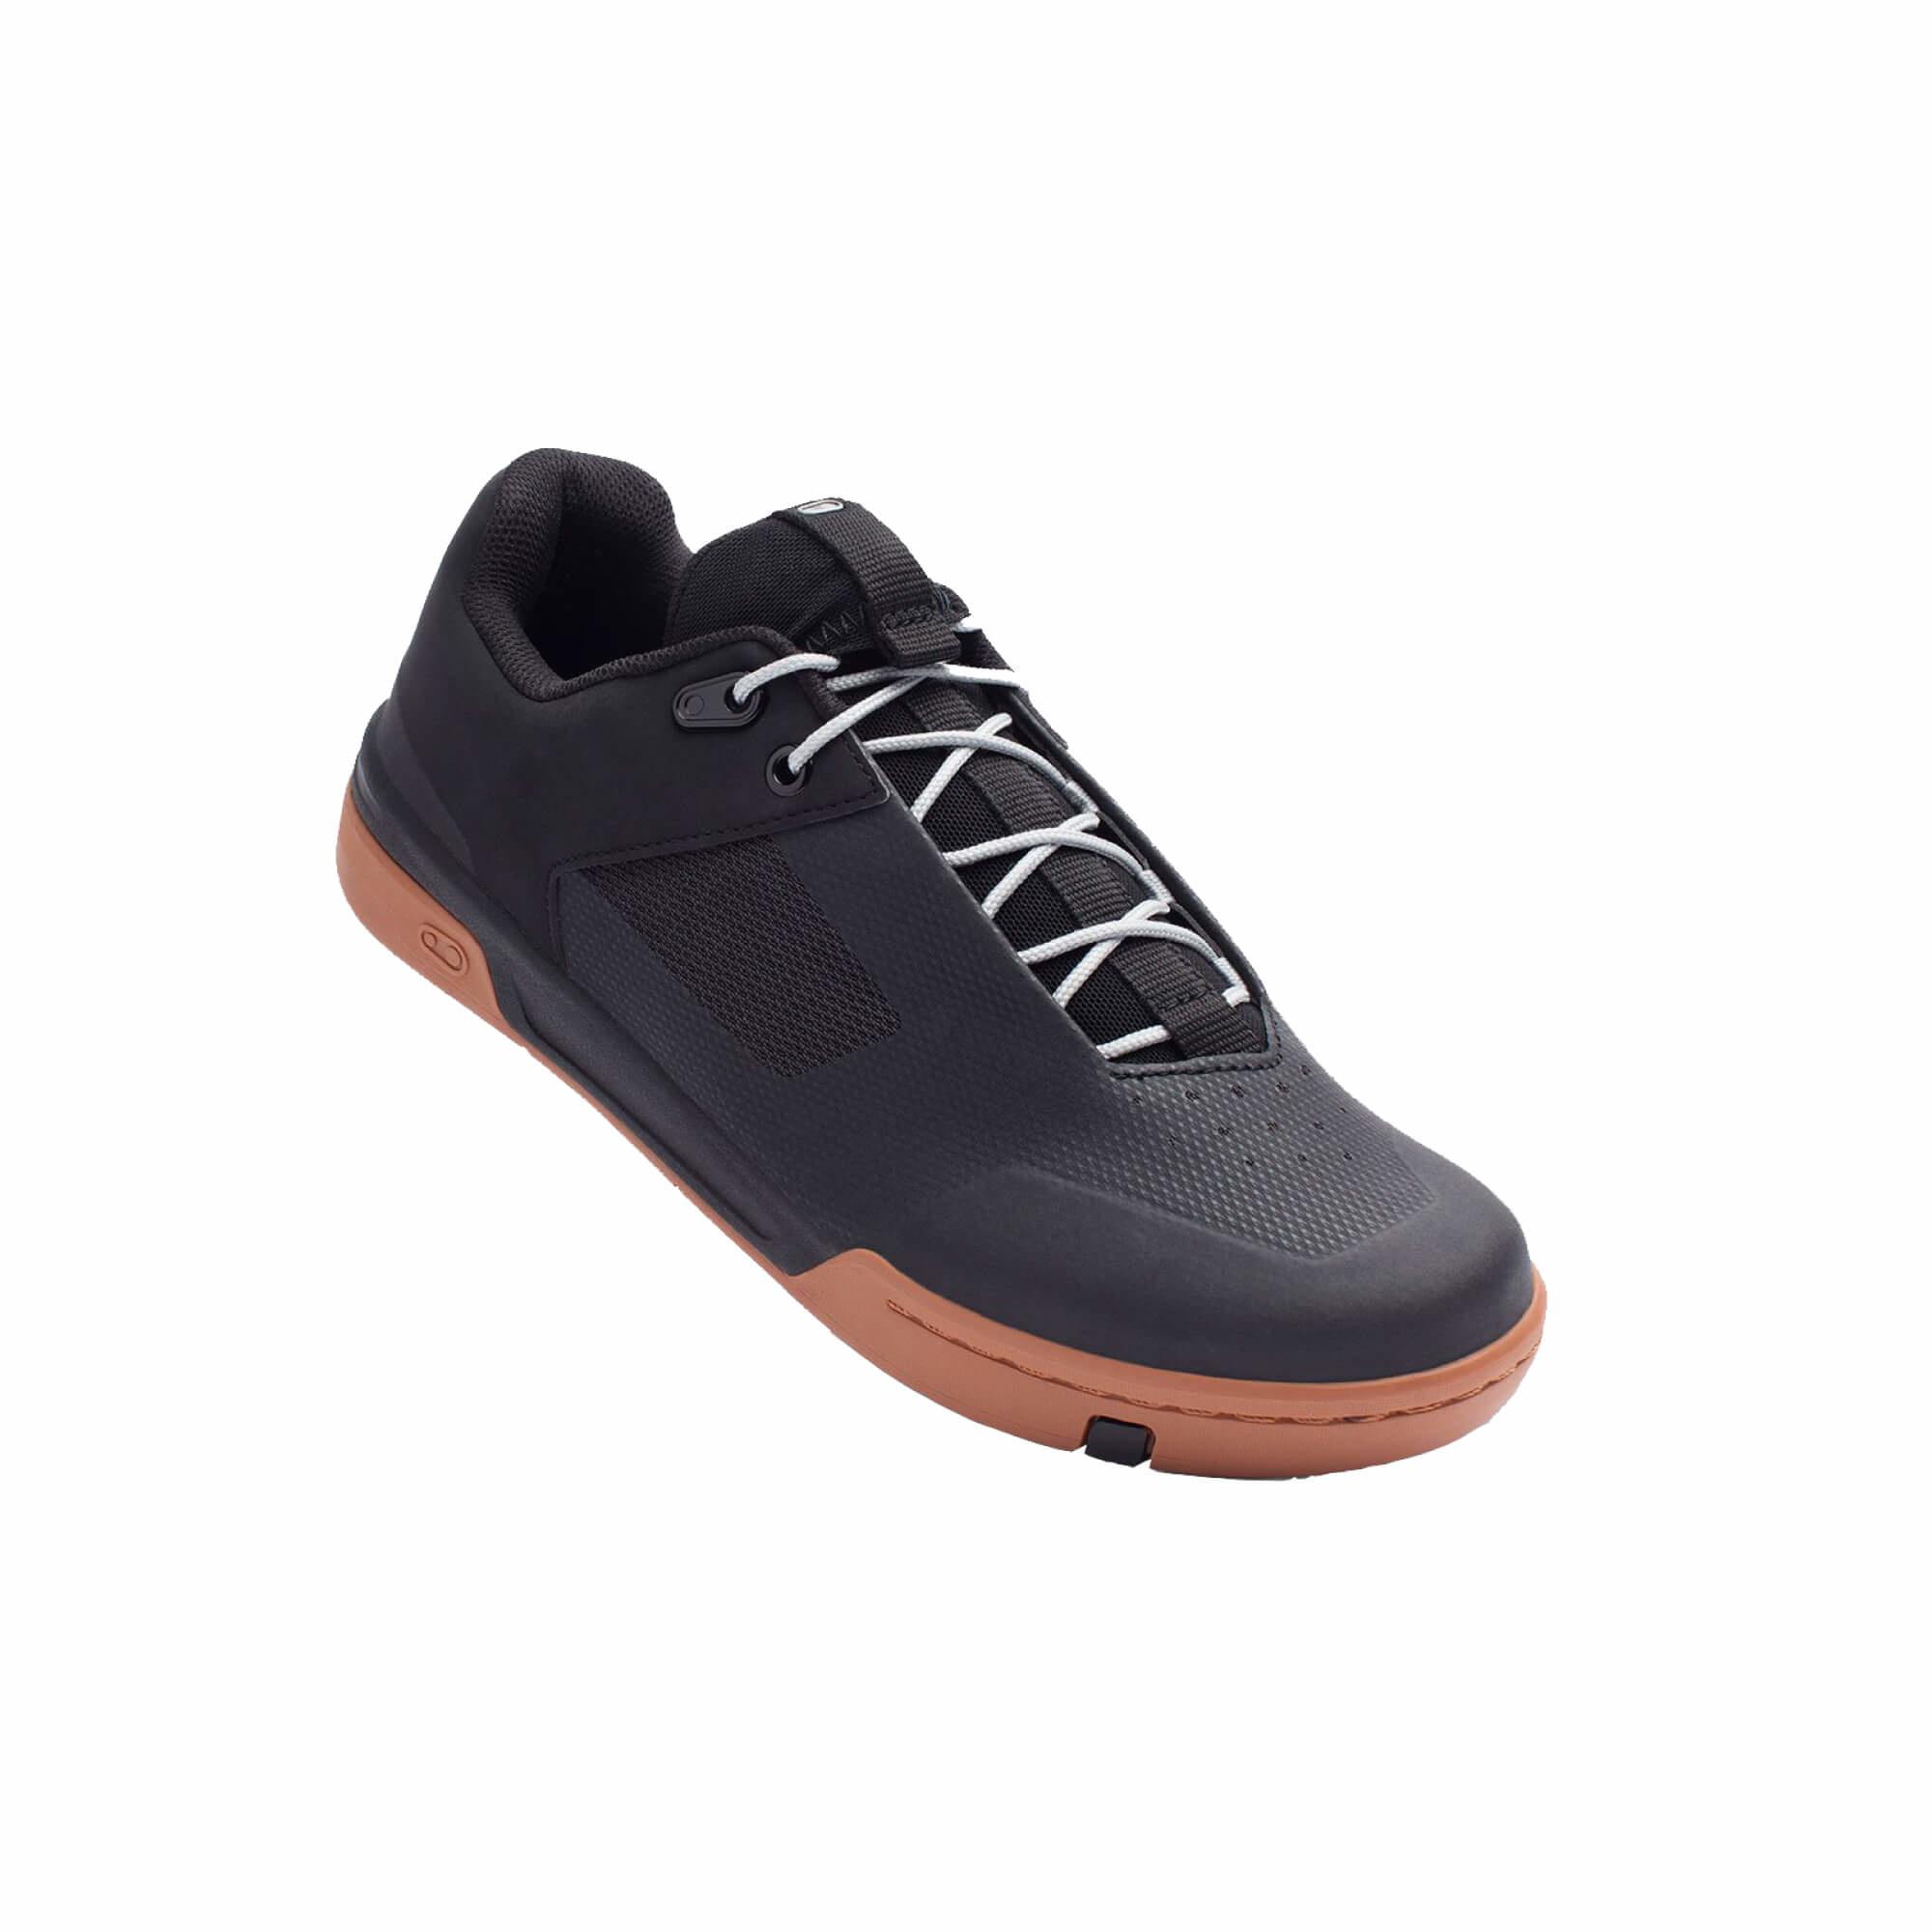 Shoe Stamp Lace Flat-3